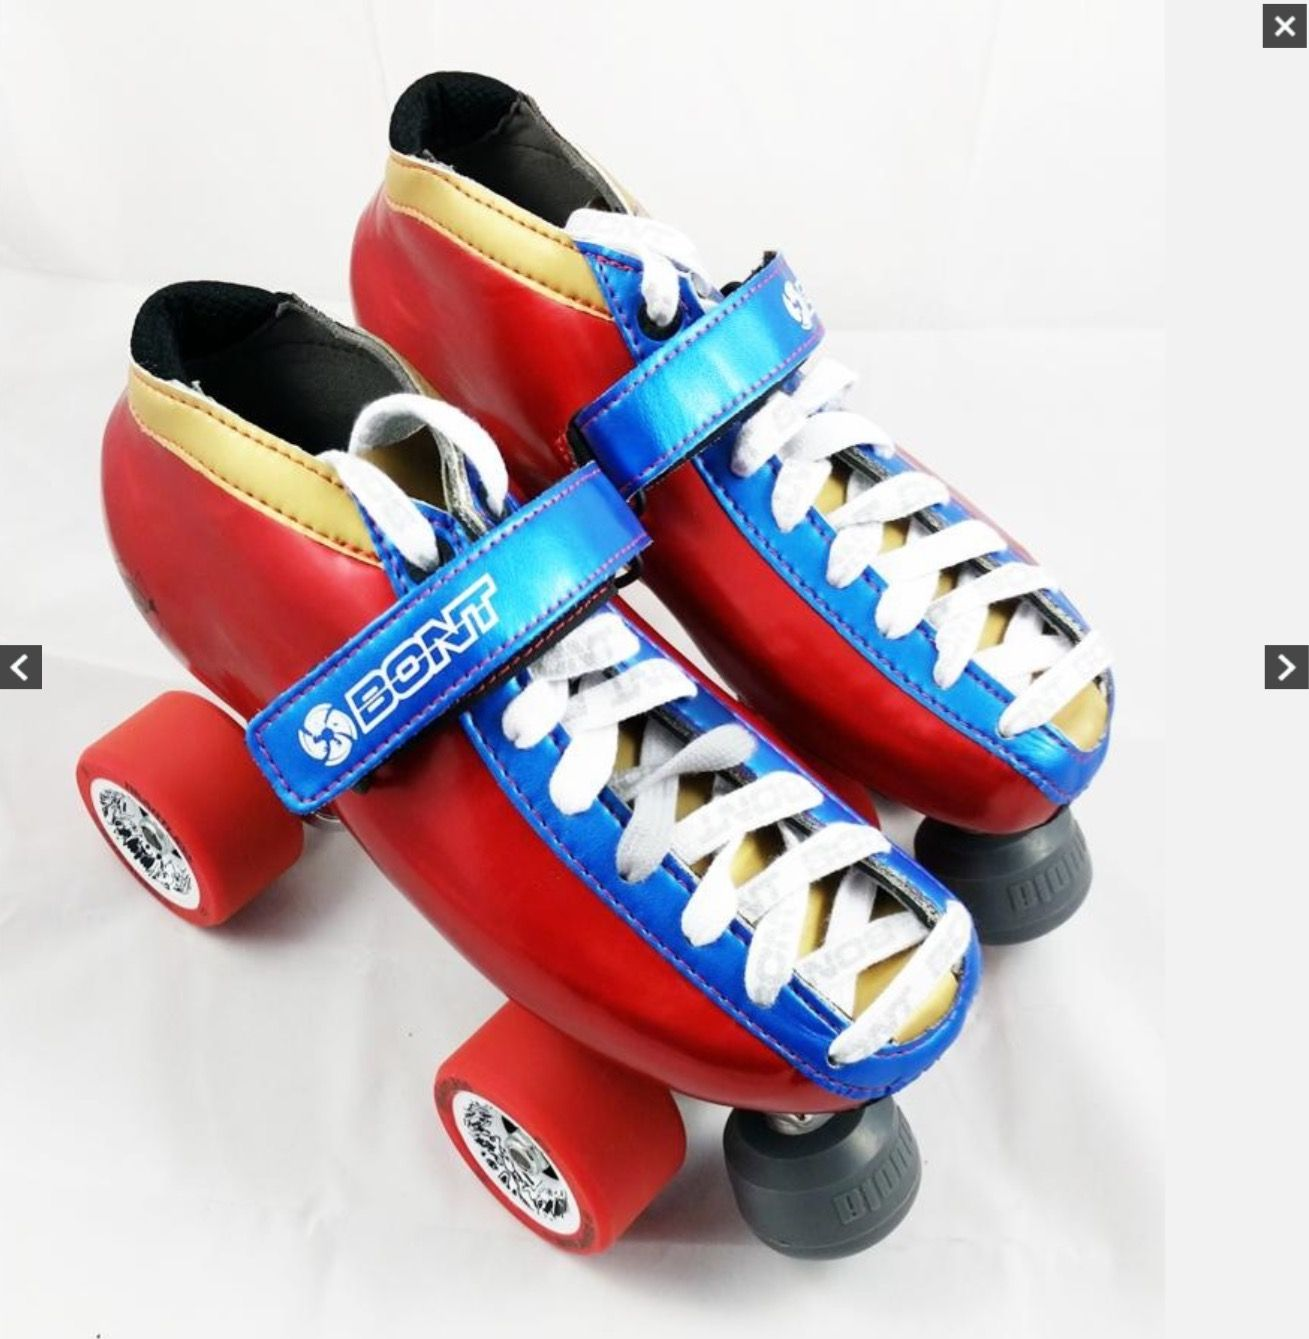 Roller tennis shoes - Bont Super Hero Custom Quad Skates